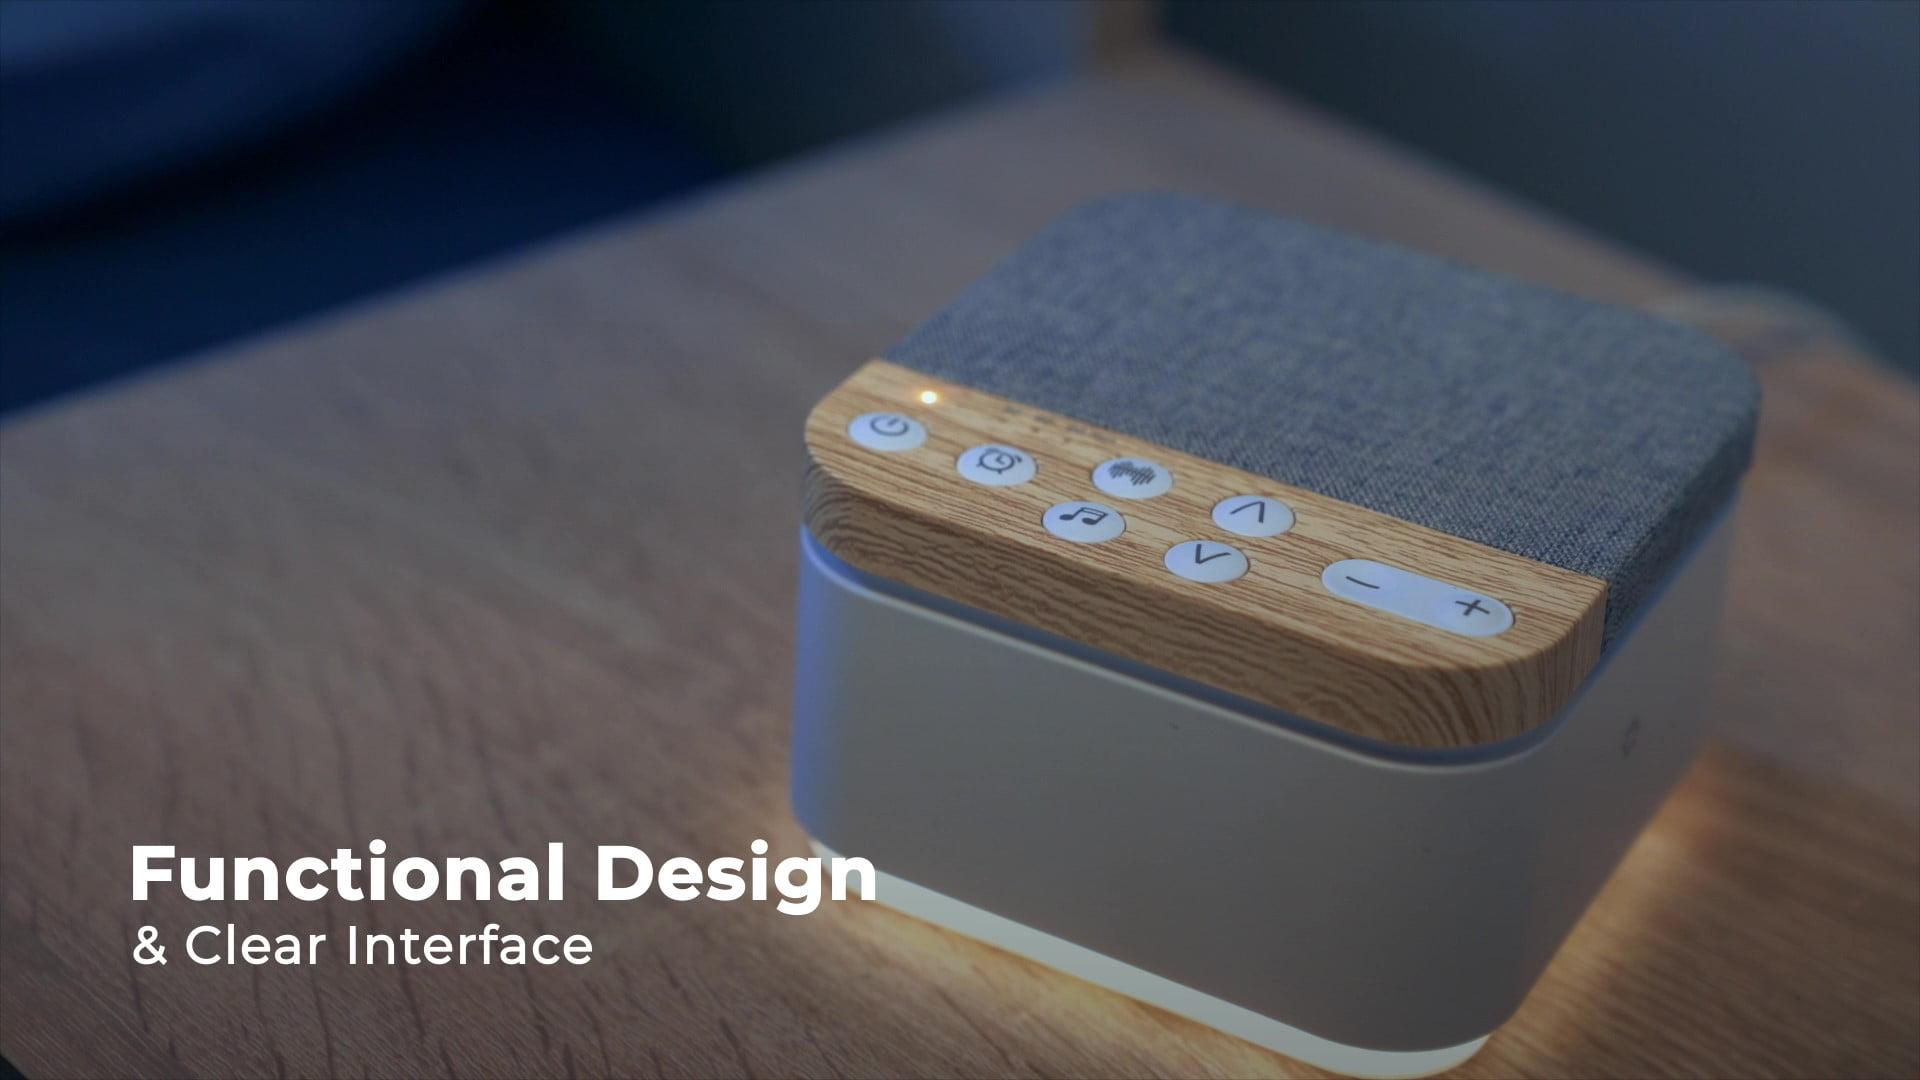 Zizz-sol-funtional design